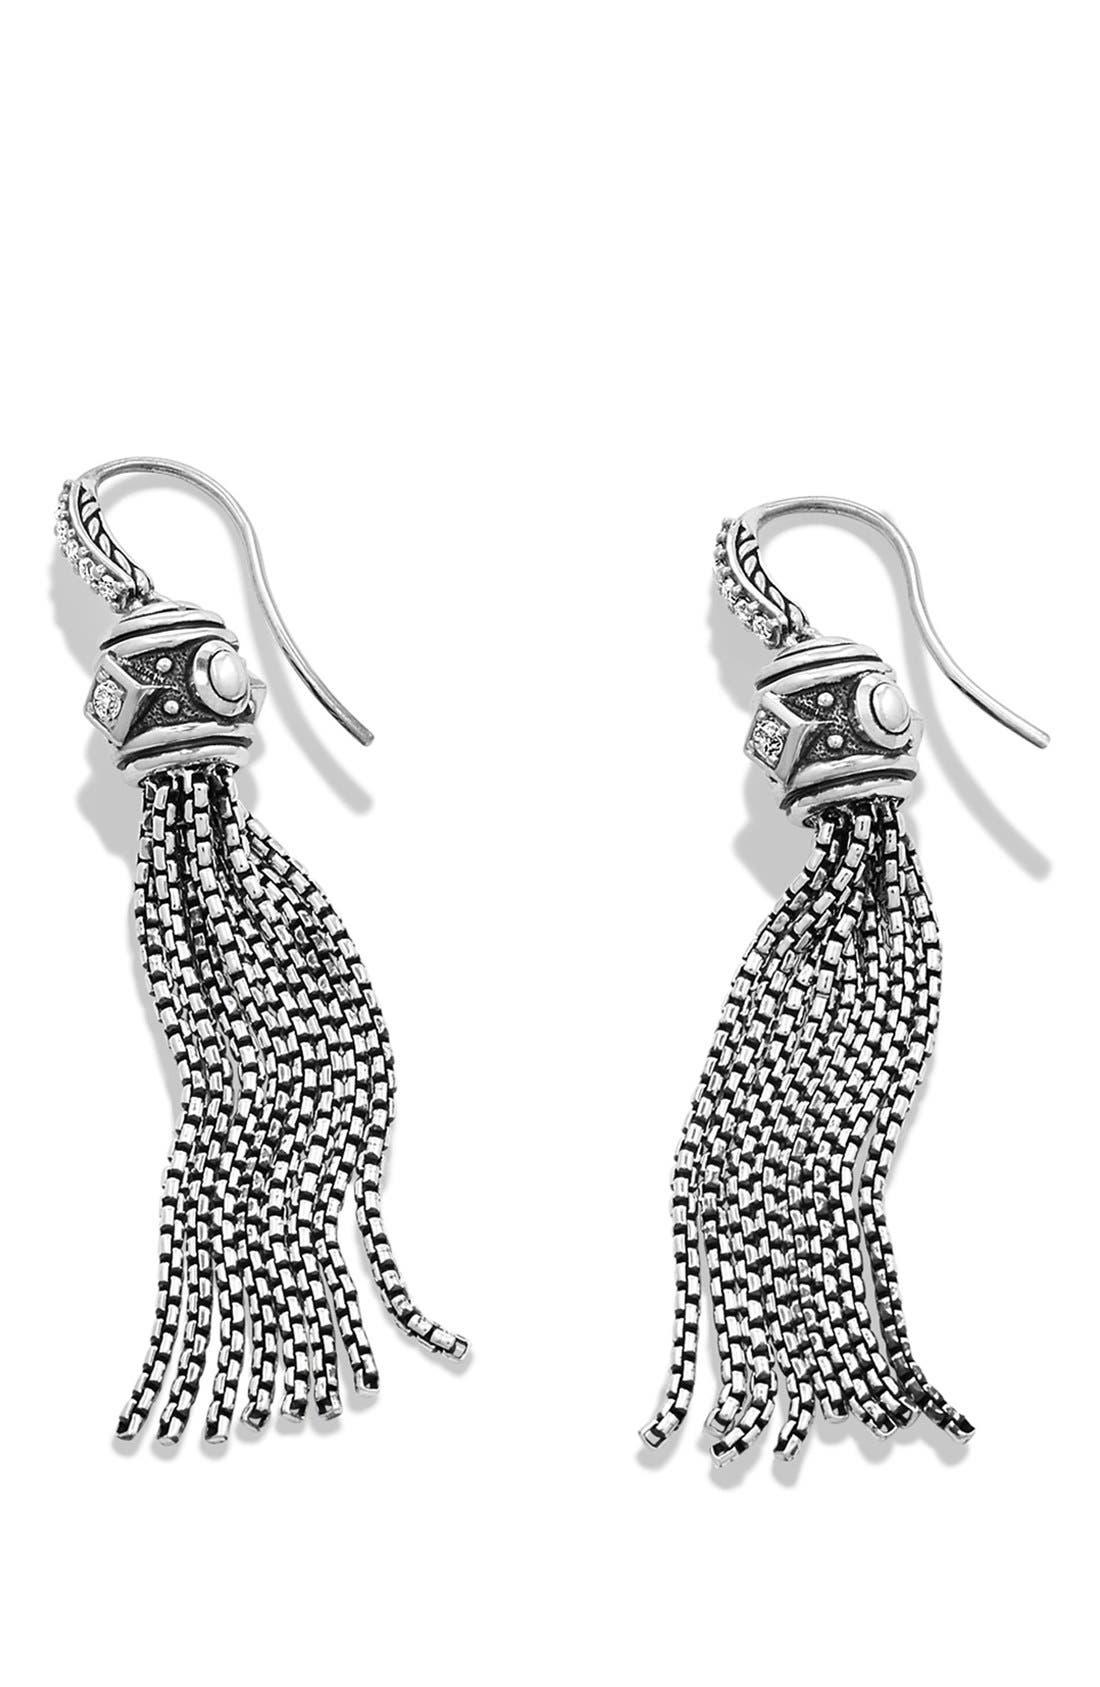 'Renaissance' Tassel Earrings with Diamonds in Silver,                             Alternate thumbnail 2, color,                             040